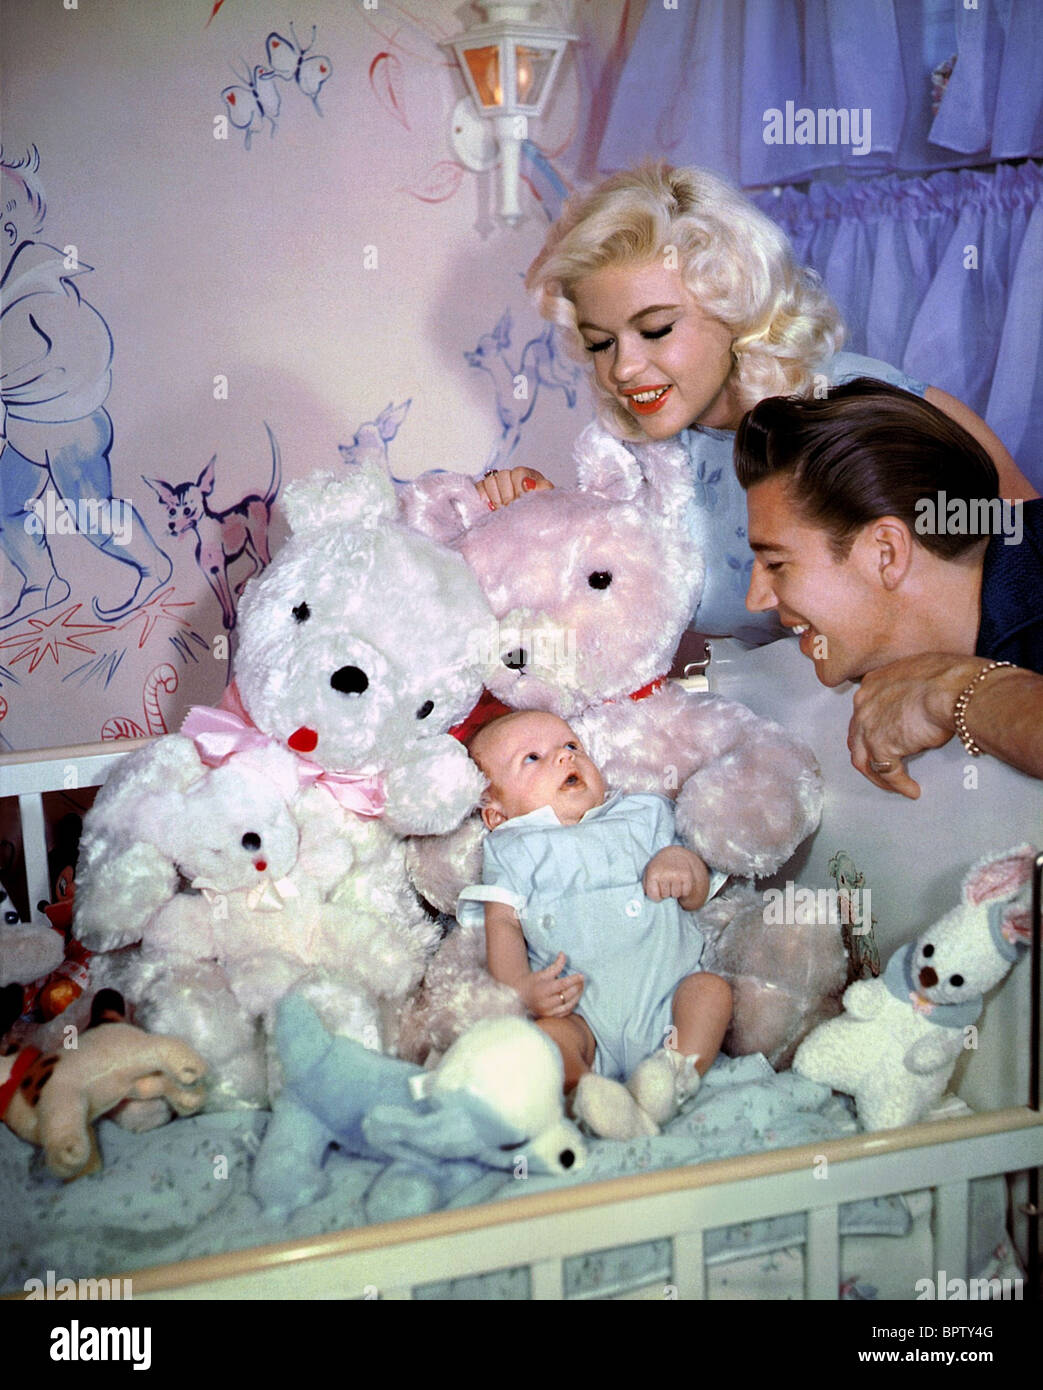 Jayne mansfield mickey hargitay married actress actor 1959 stock image